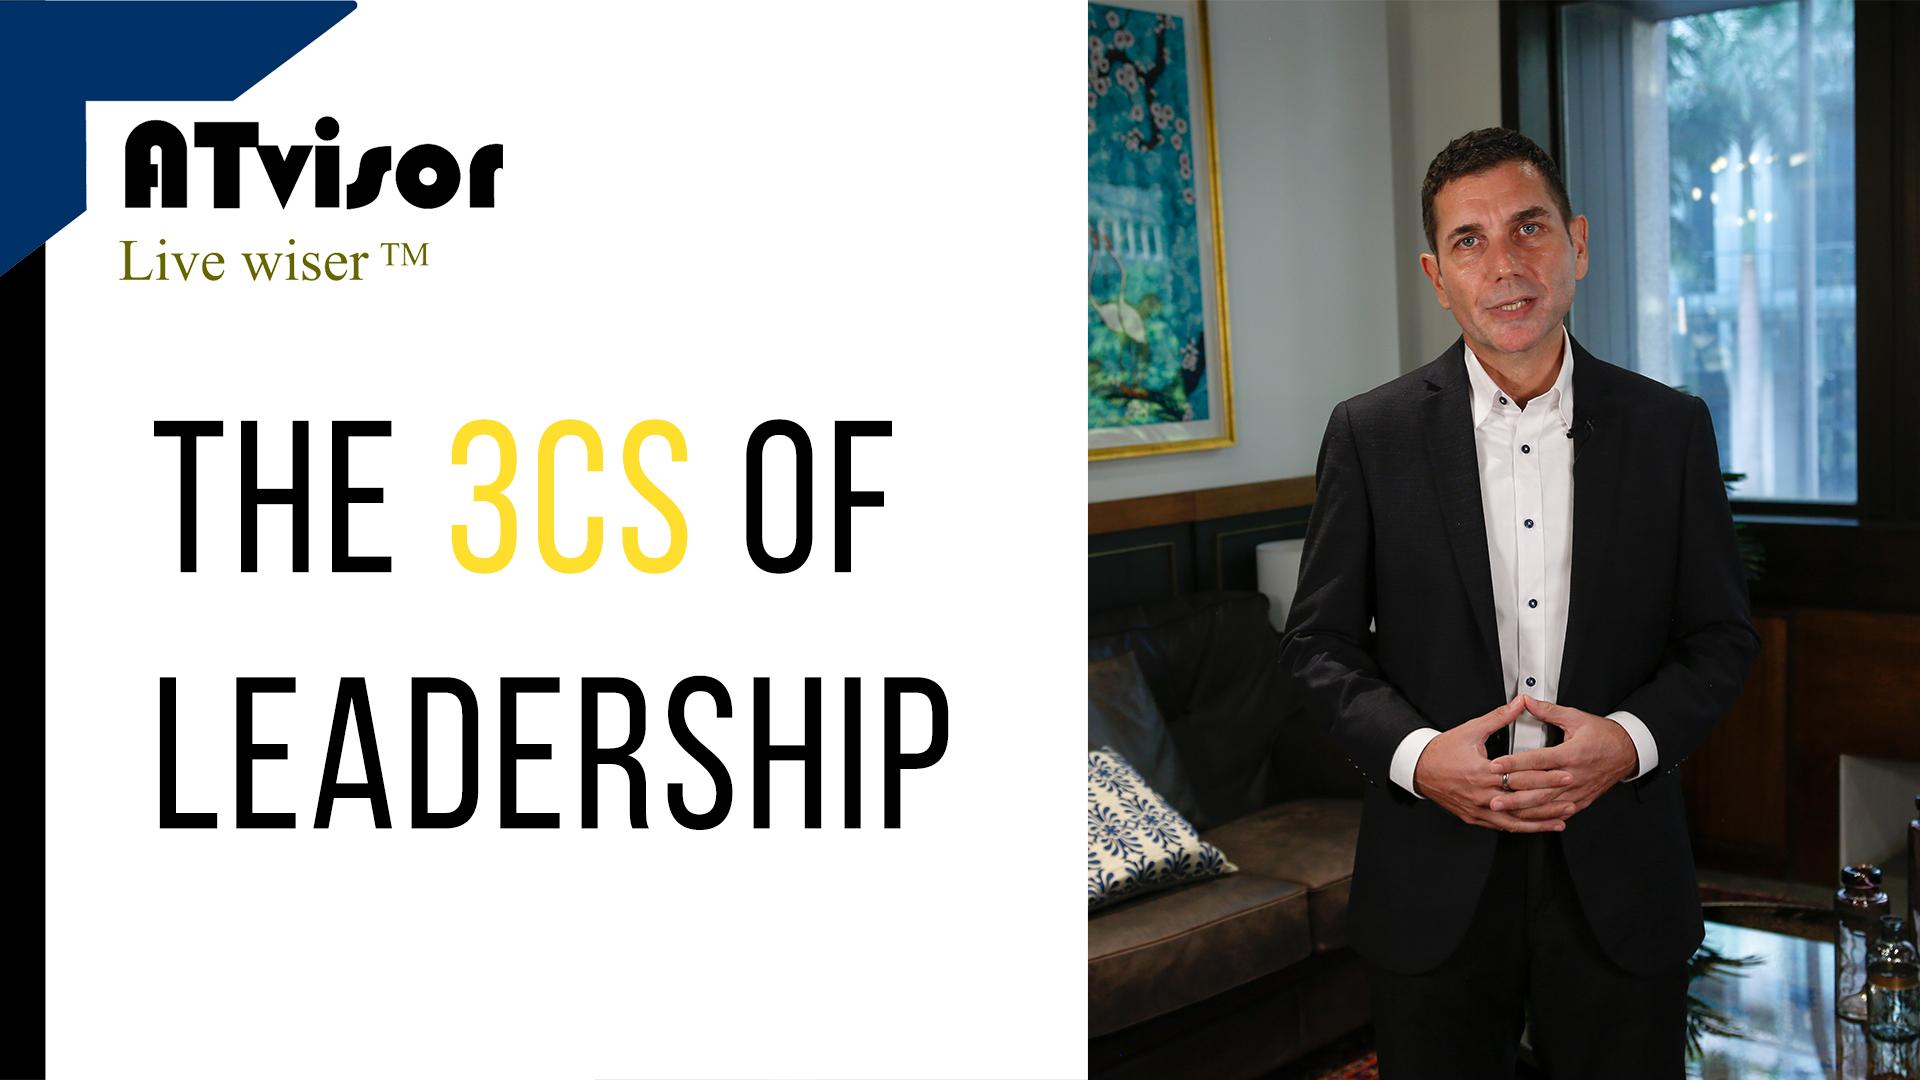 The 3 Cs of Leadership